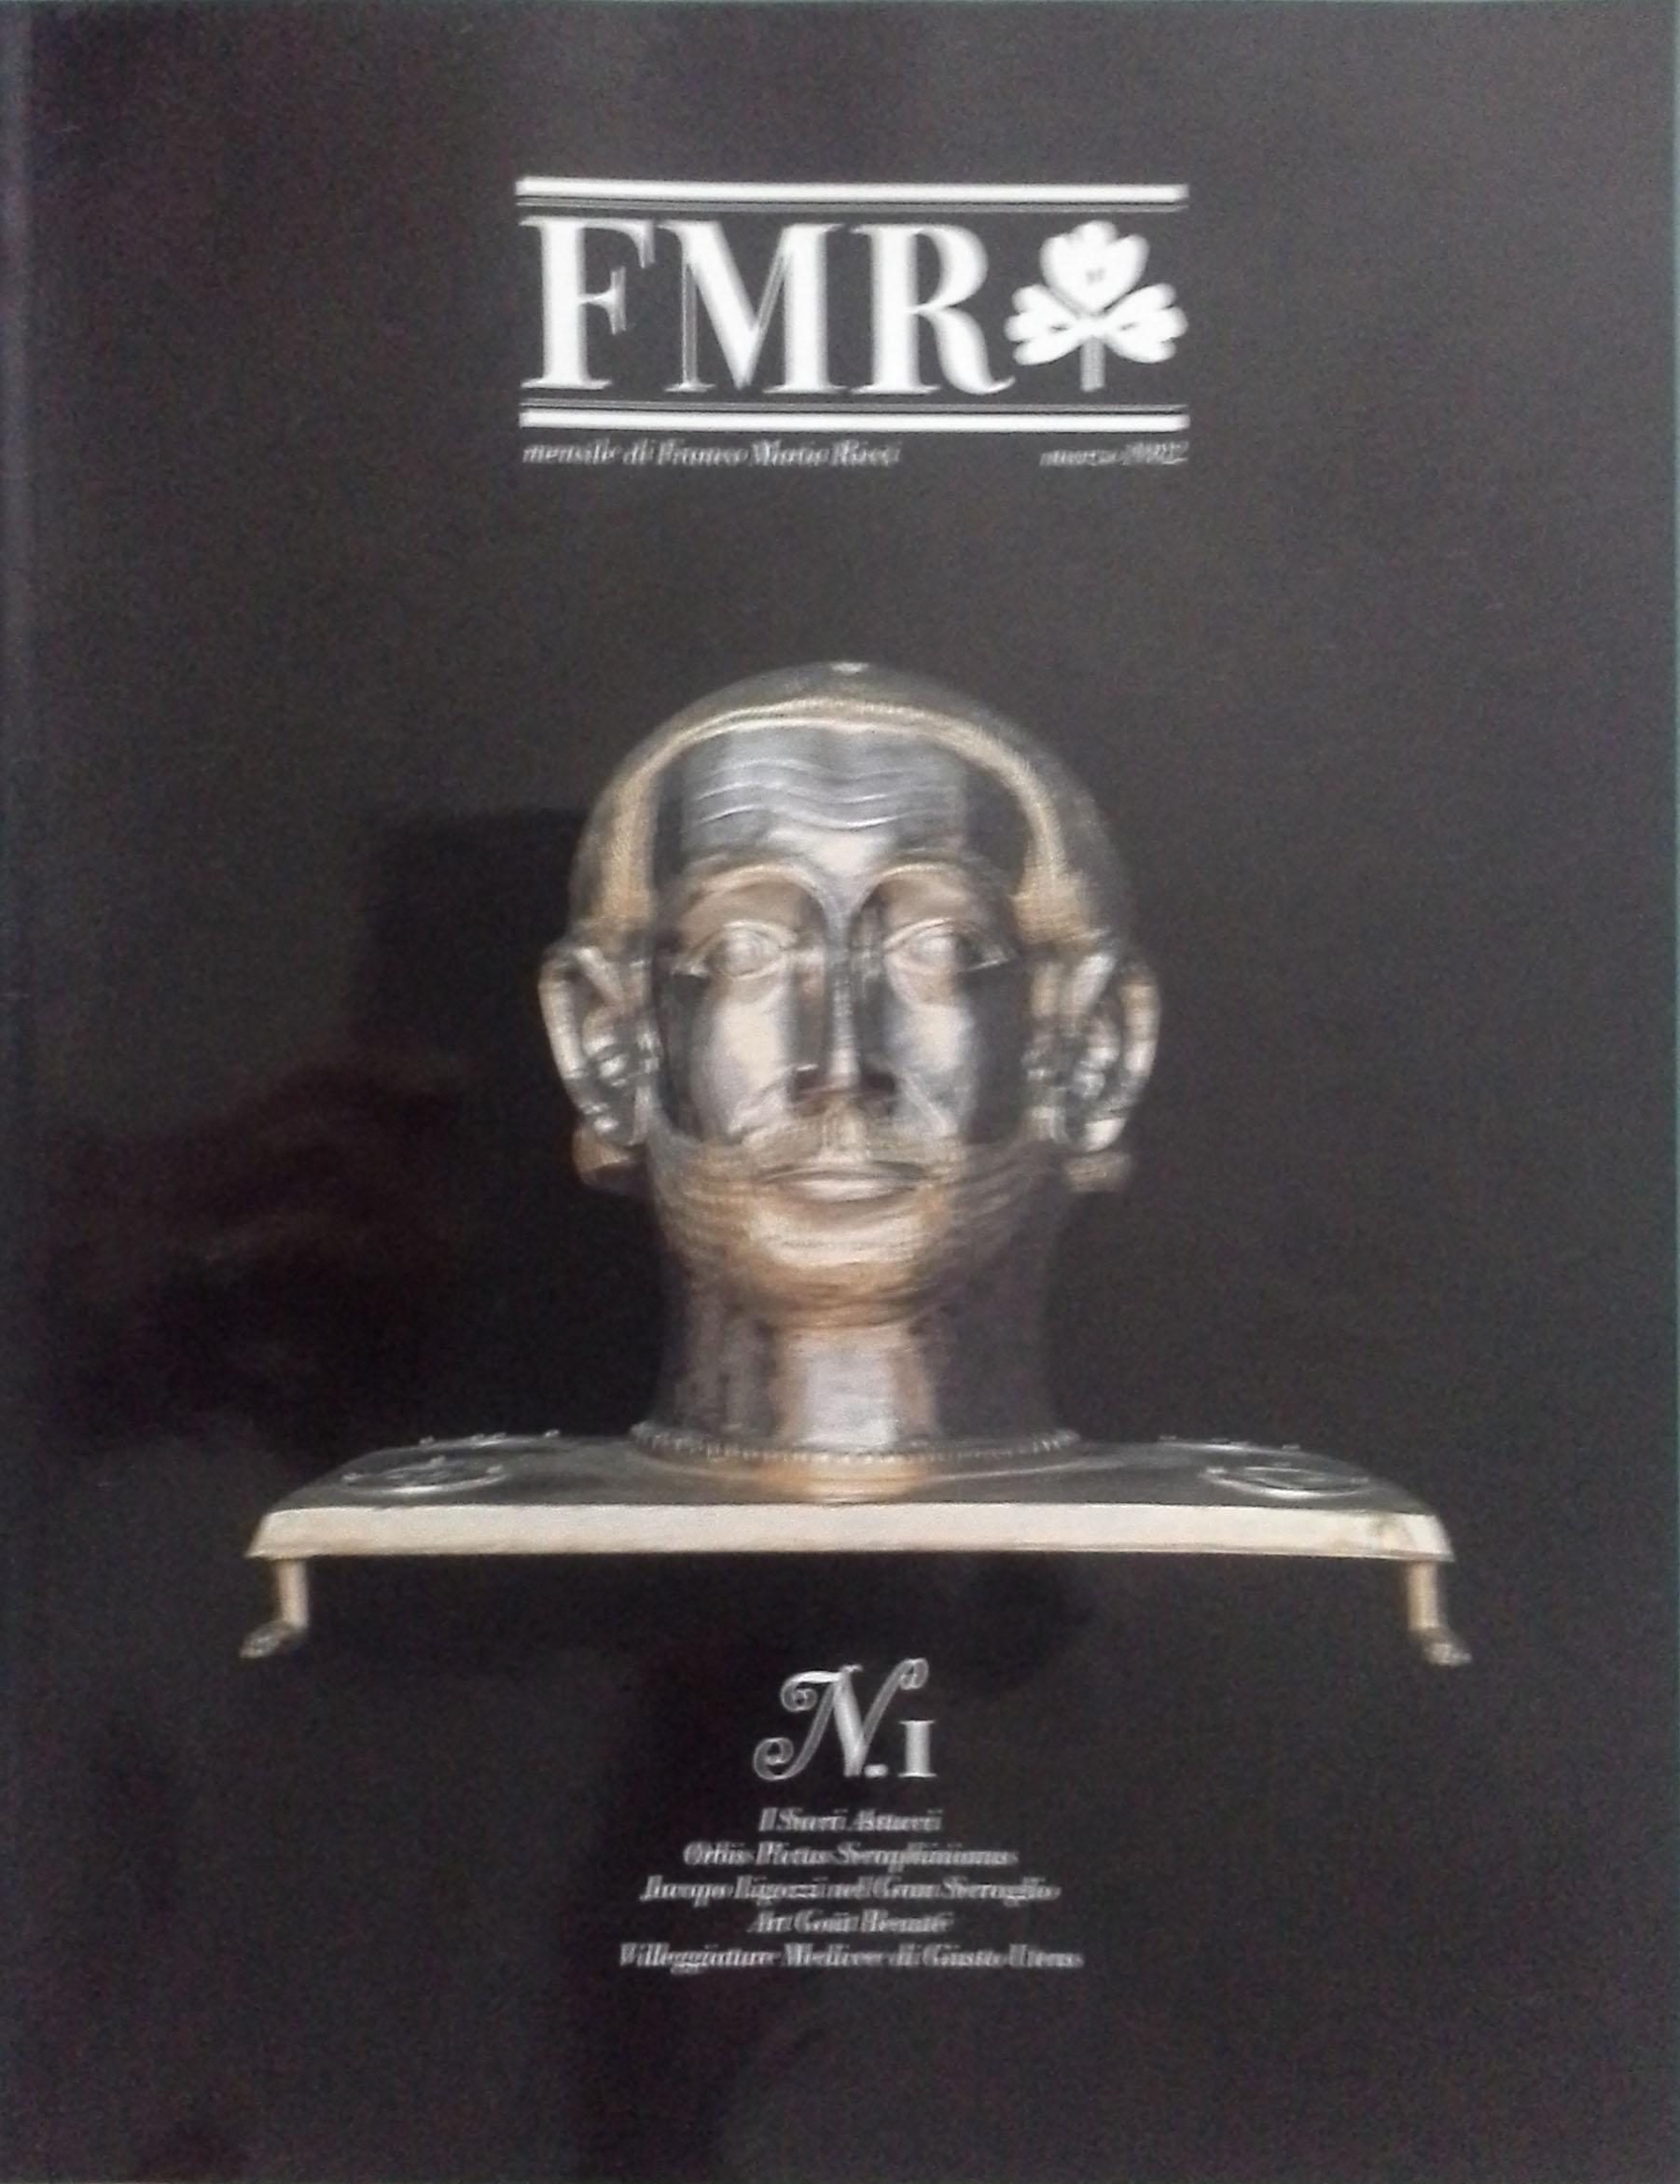 Riviste Franco Maria Ricci – FMR